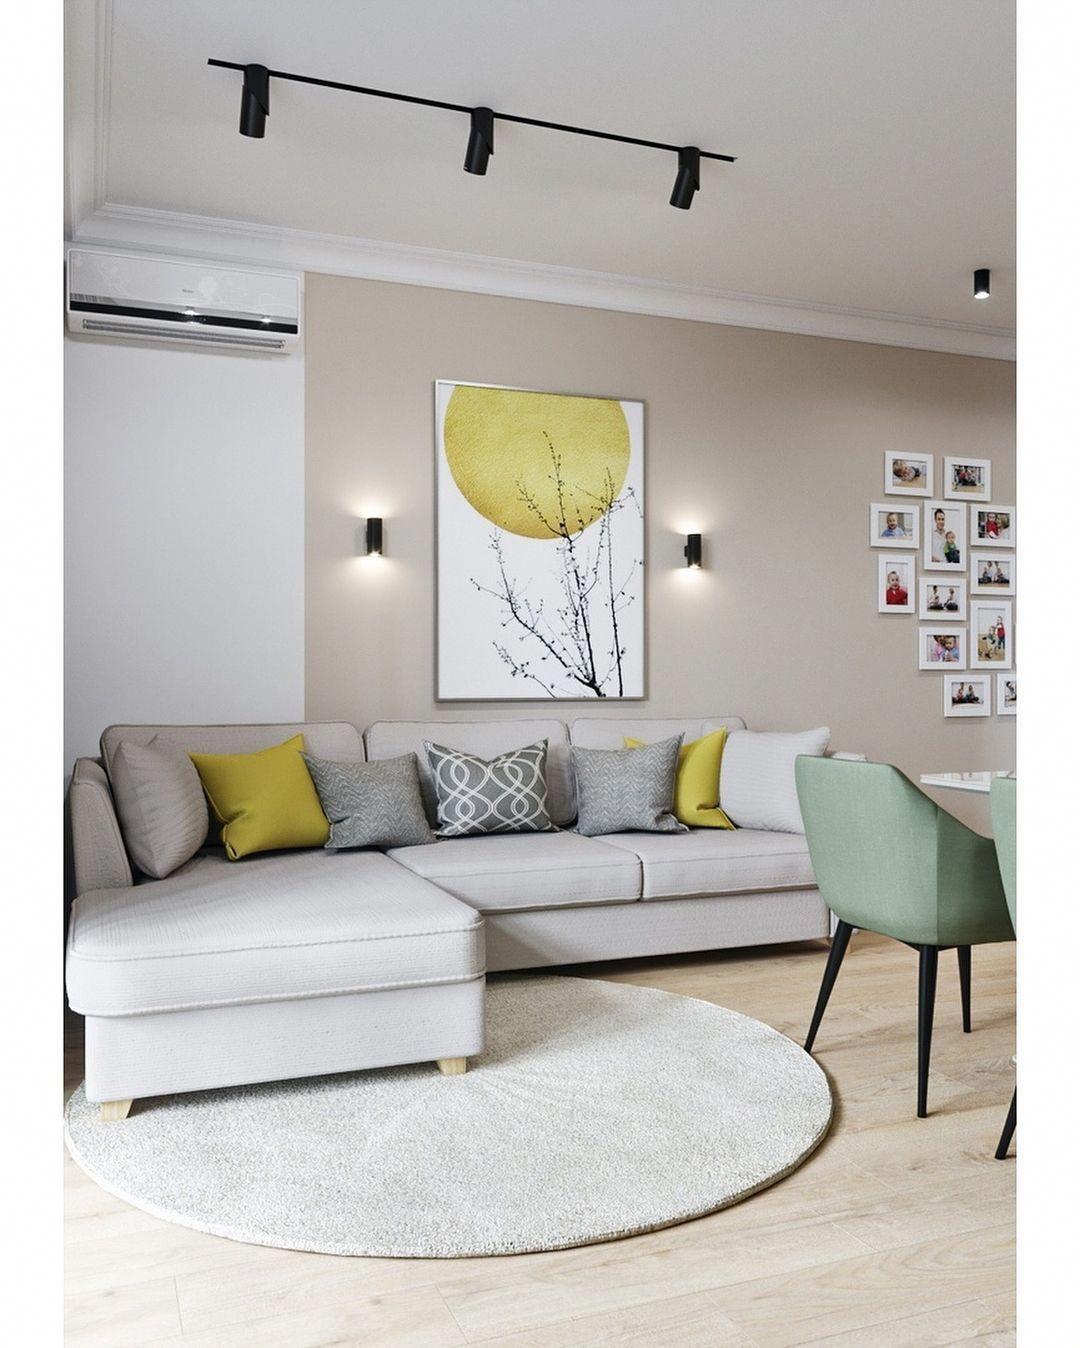 Des Inspirations De Decoration De Salon A Inspirer Le Luxe Est Au Coin De La Rue Salon Interior Design Living Room Living Room Lighting Living Room Decor